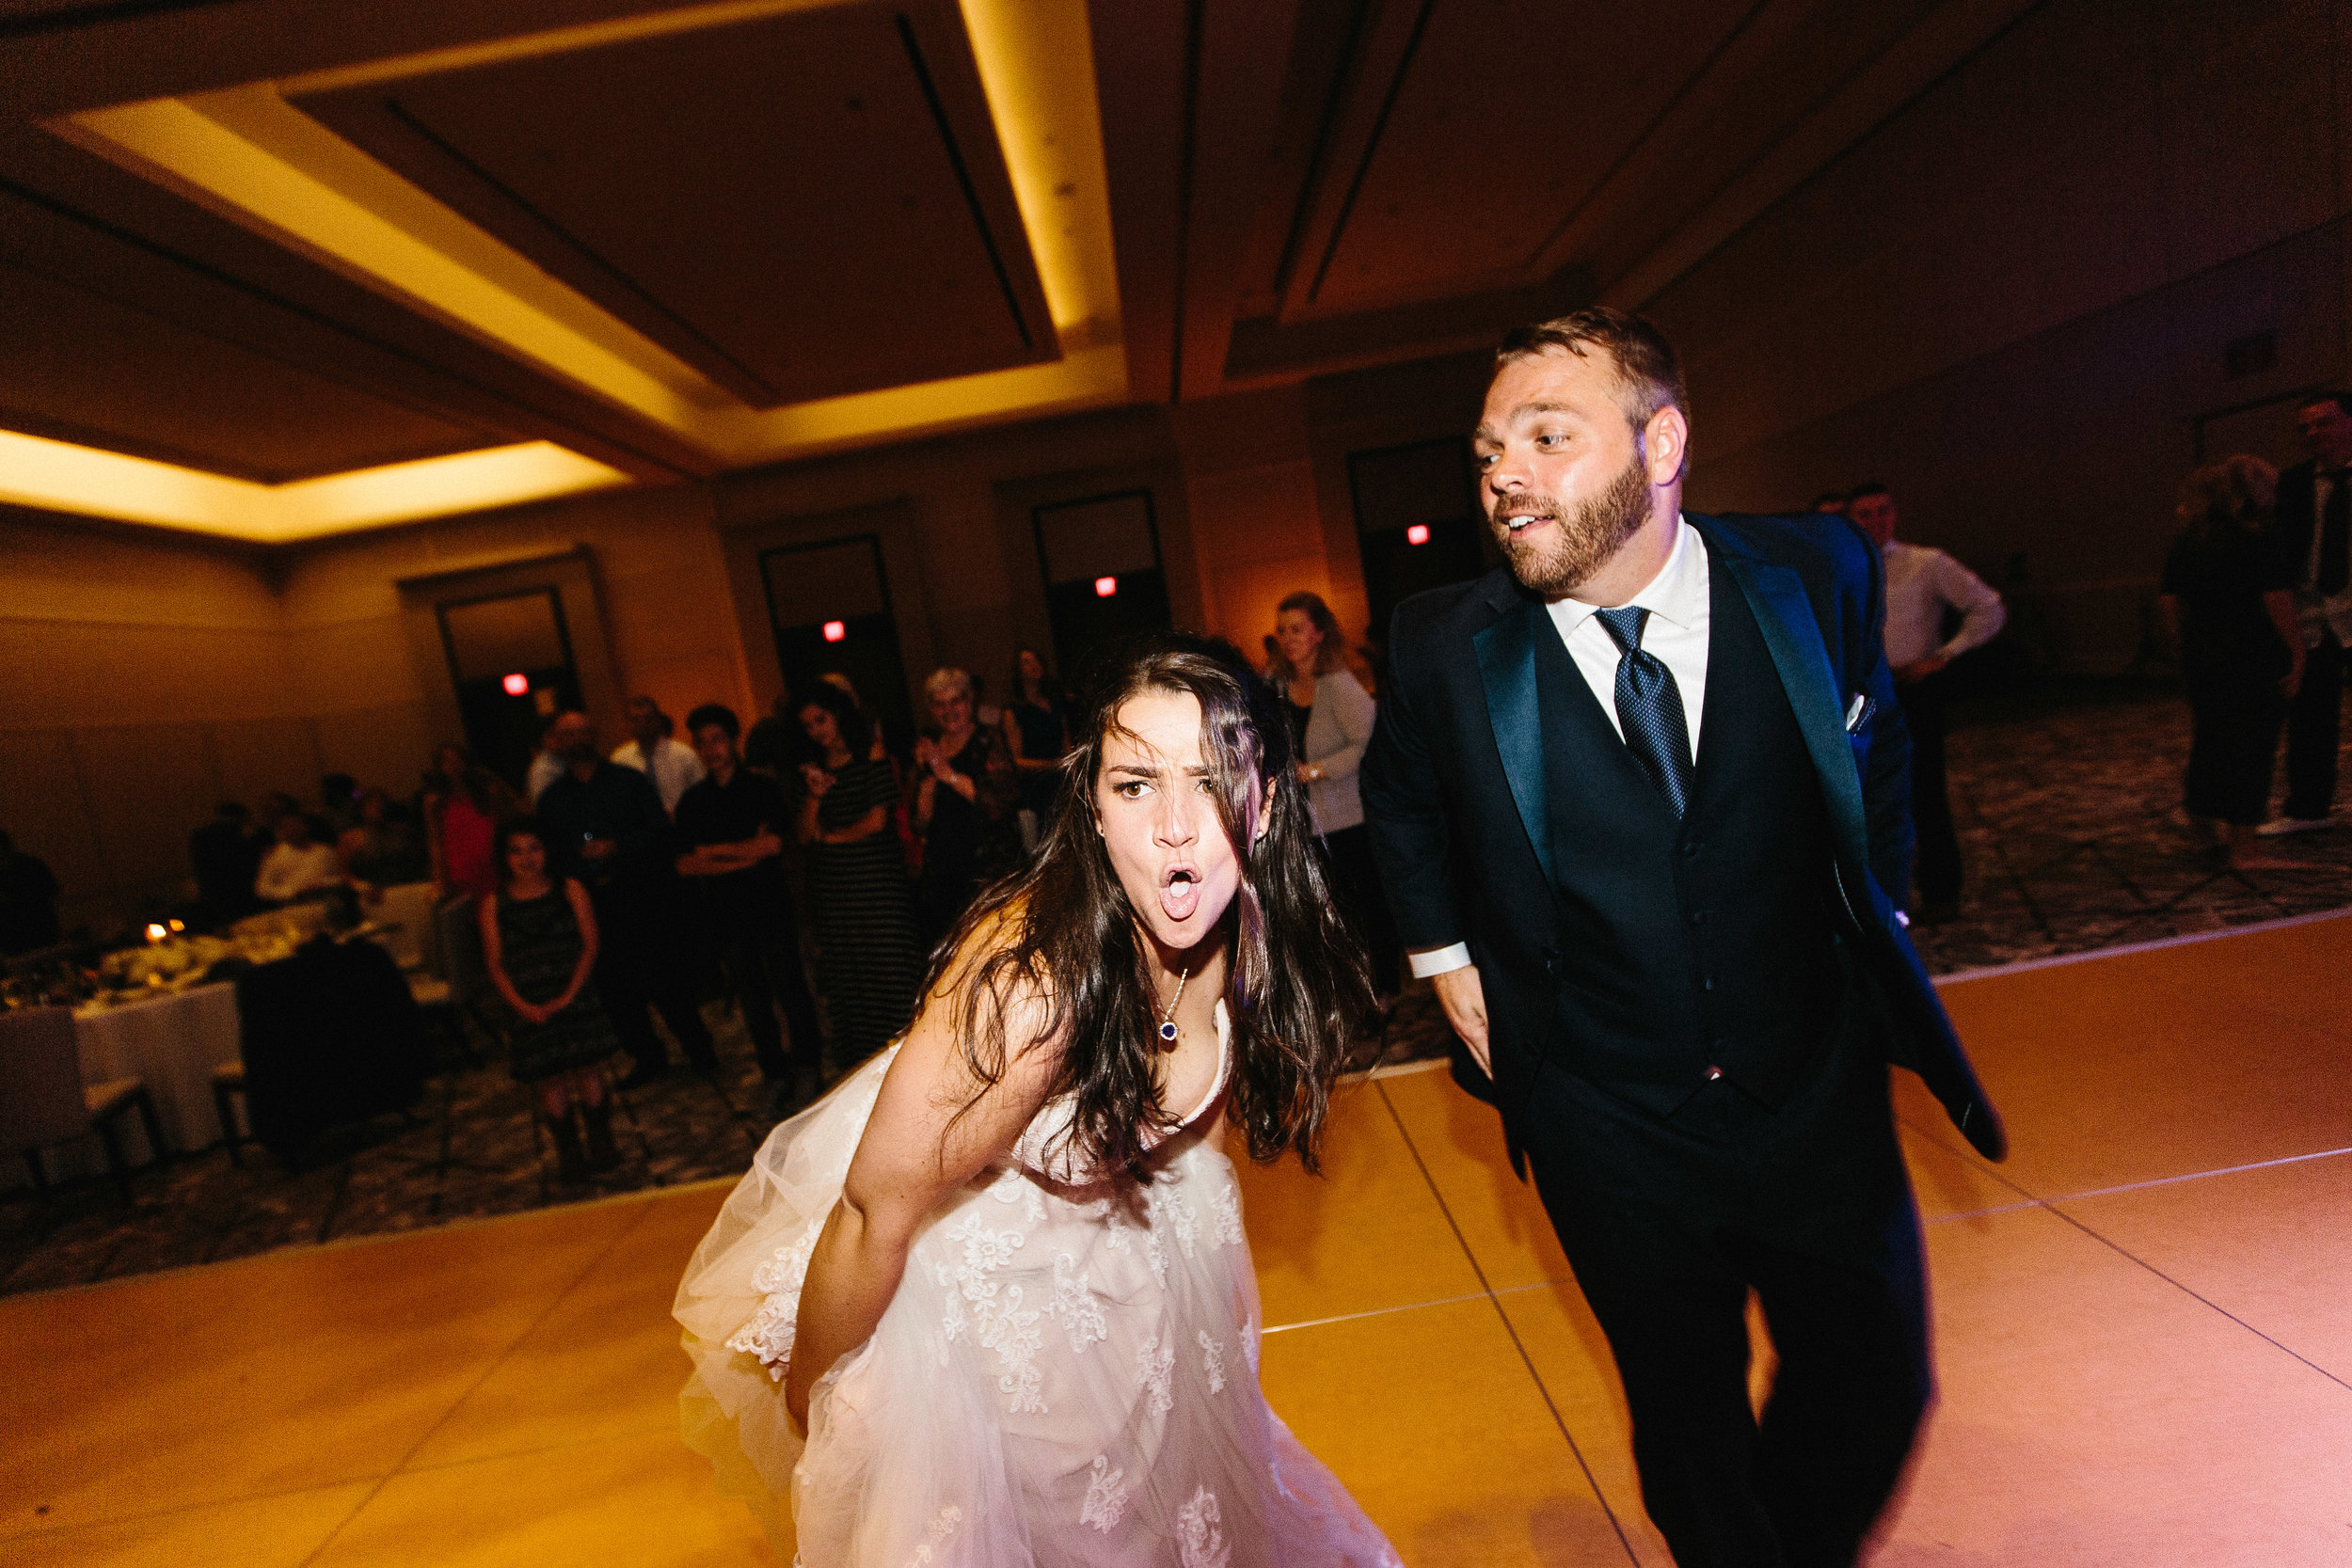 roswell_st_peter_chanel_catholic_avalon_hotel_alpharetta_wedding-2215.jpg